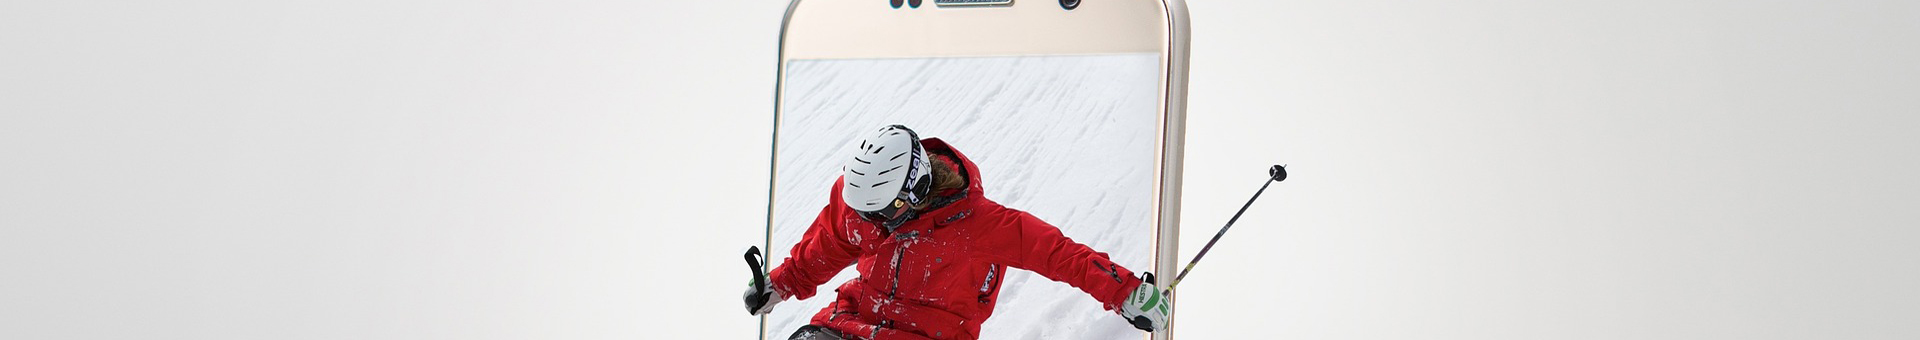 appli-mobile-ski-sybelles